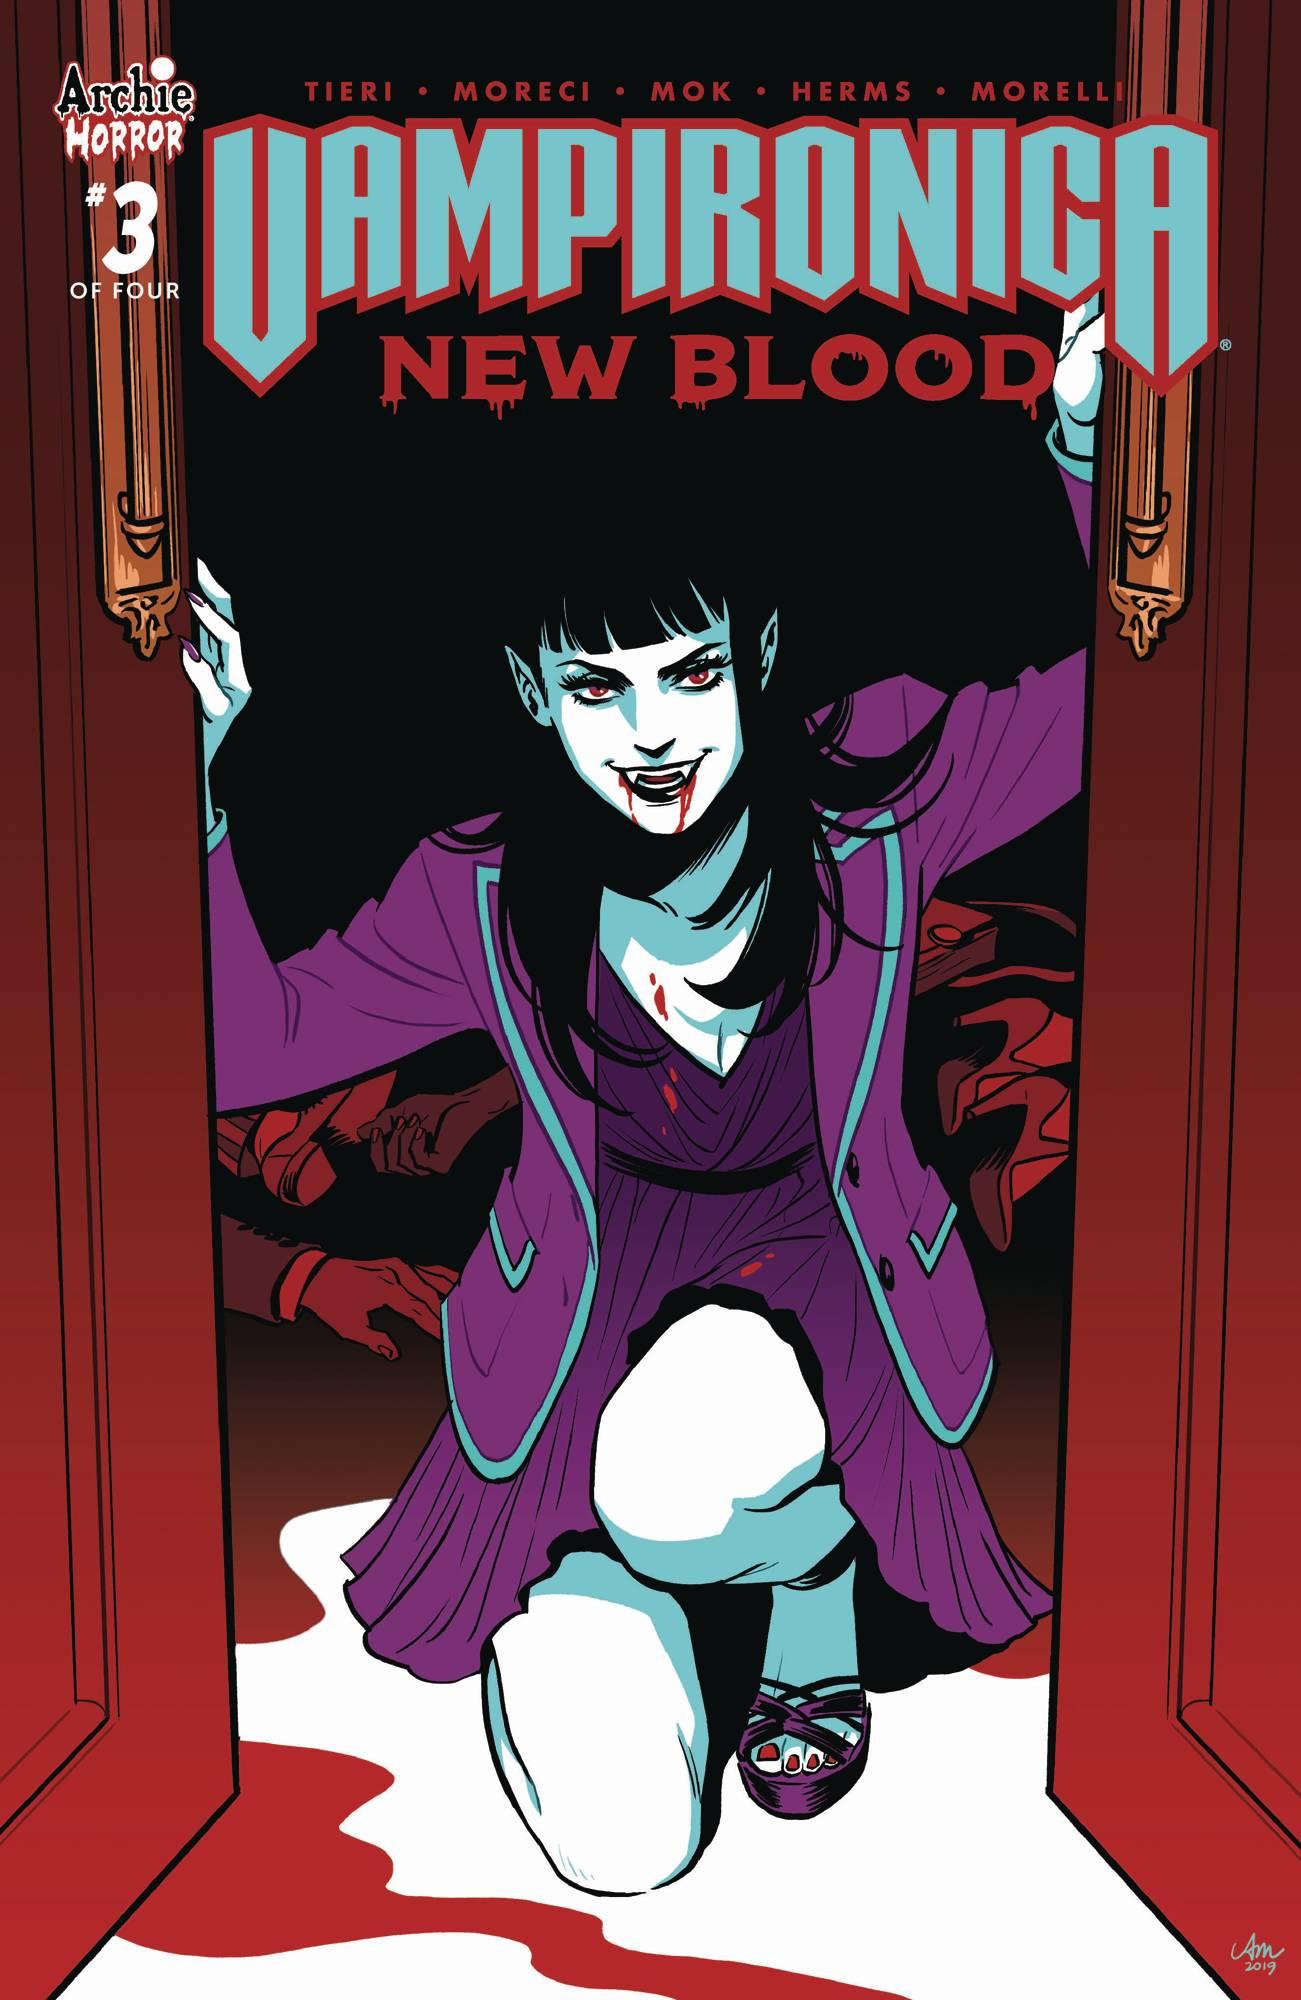 Vampironica: New Blood #3 (2020)